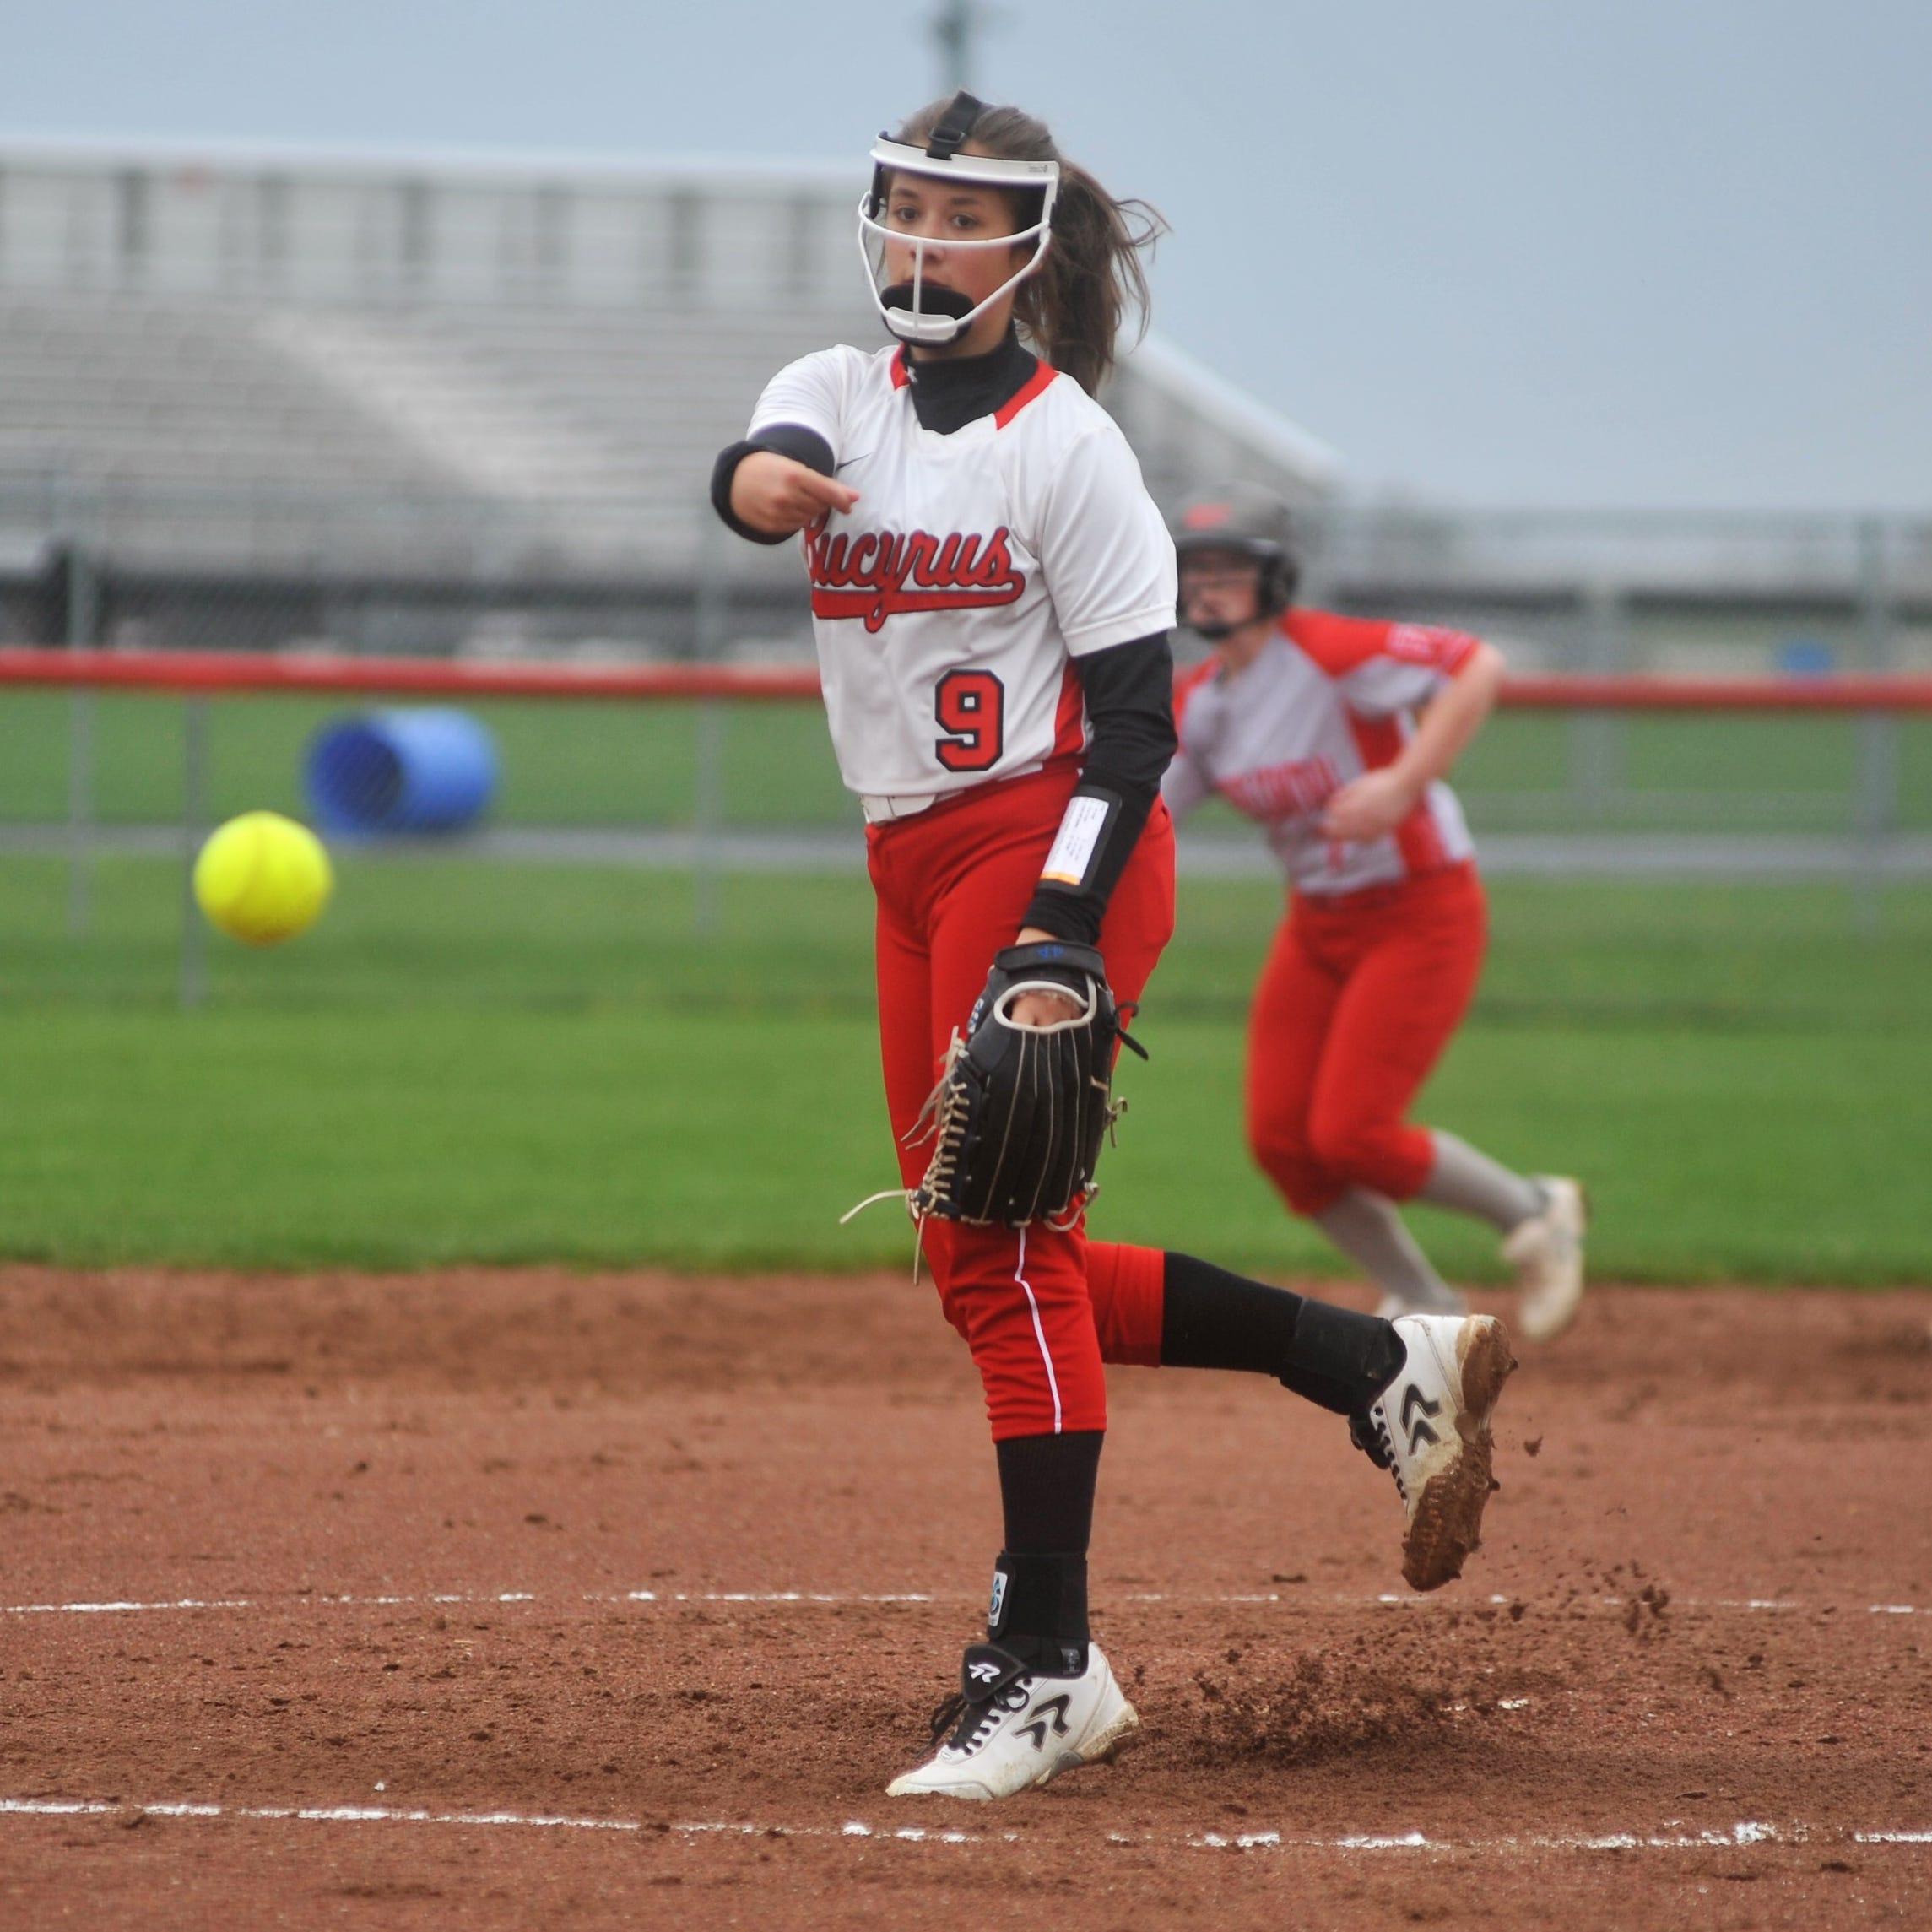 Bucyrus returns to top spot in softball power rankings